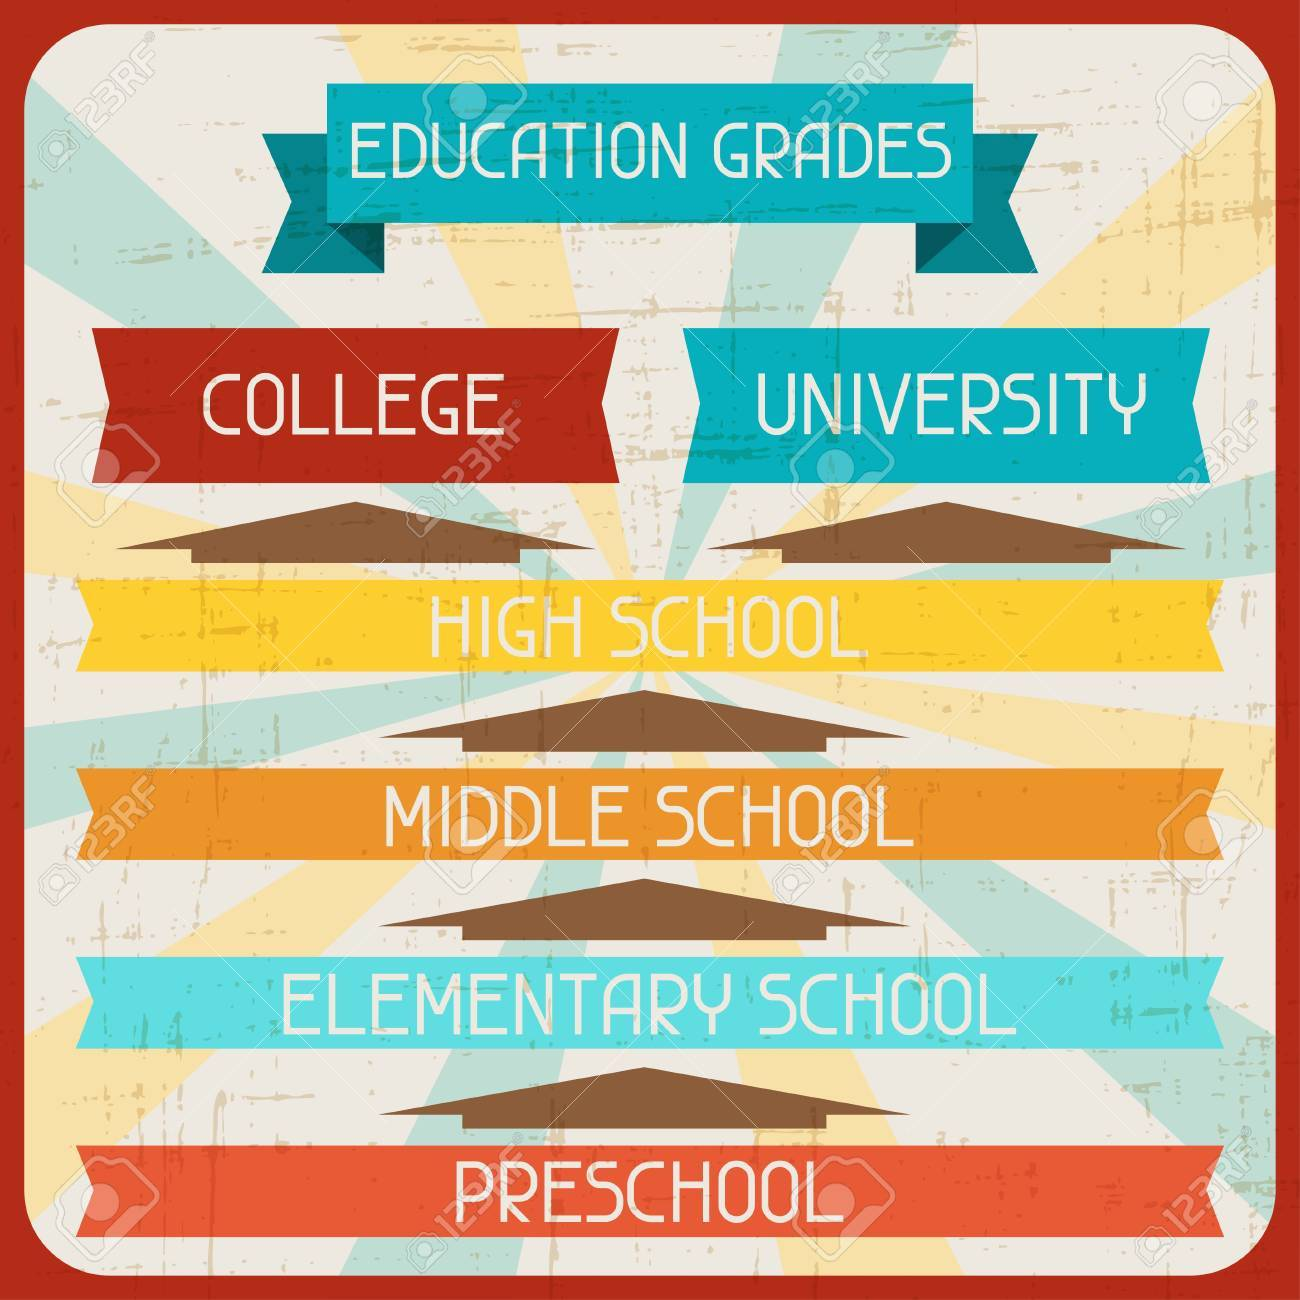 Education grades. Poster in retro style. Stock Vector - 20503120